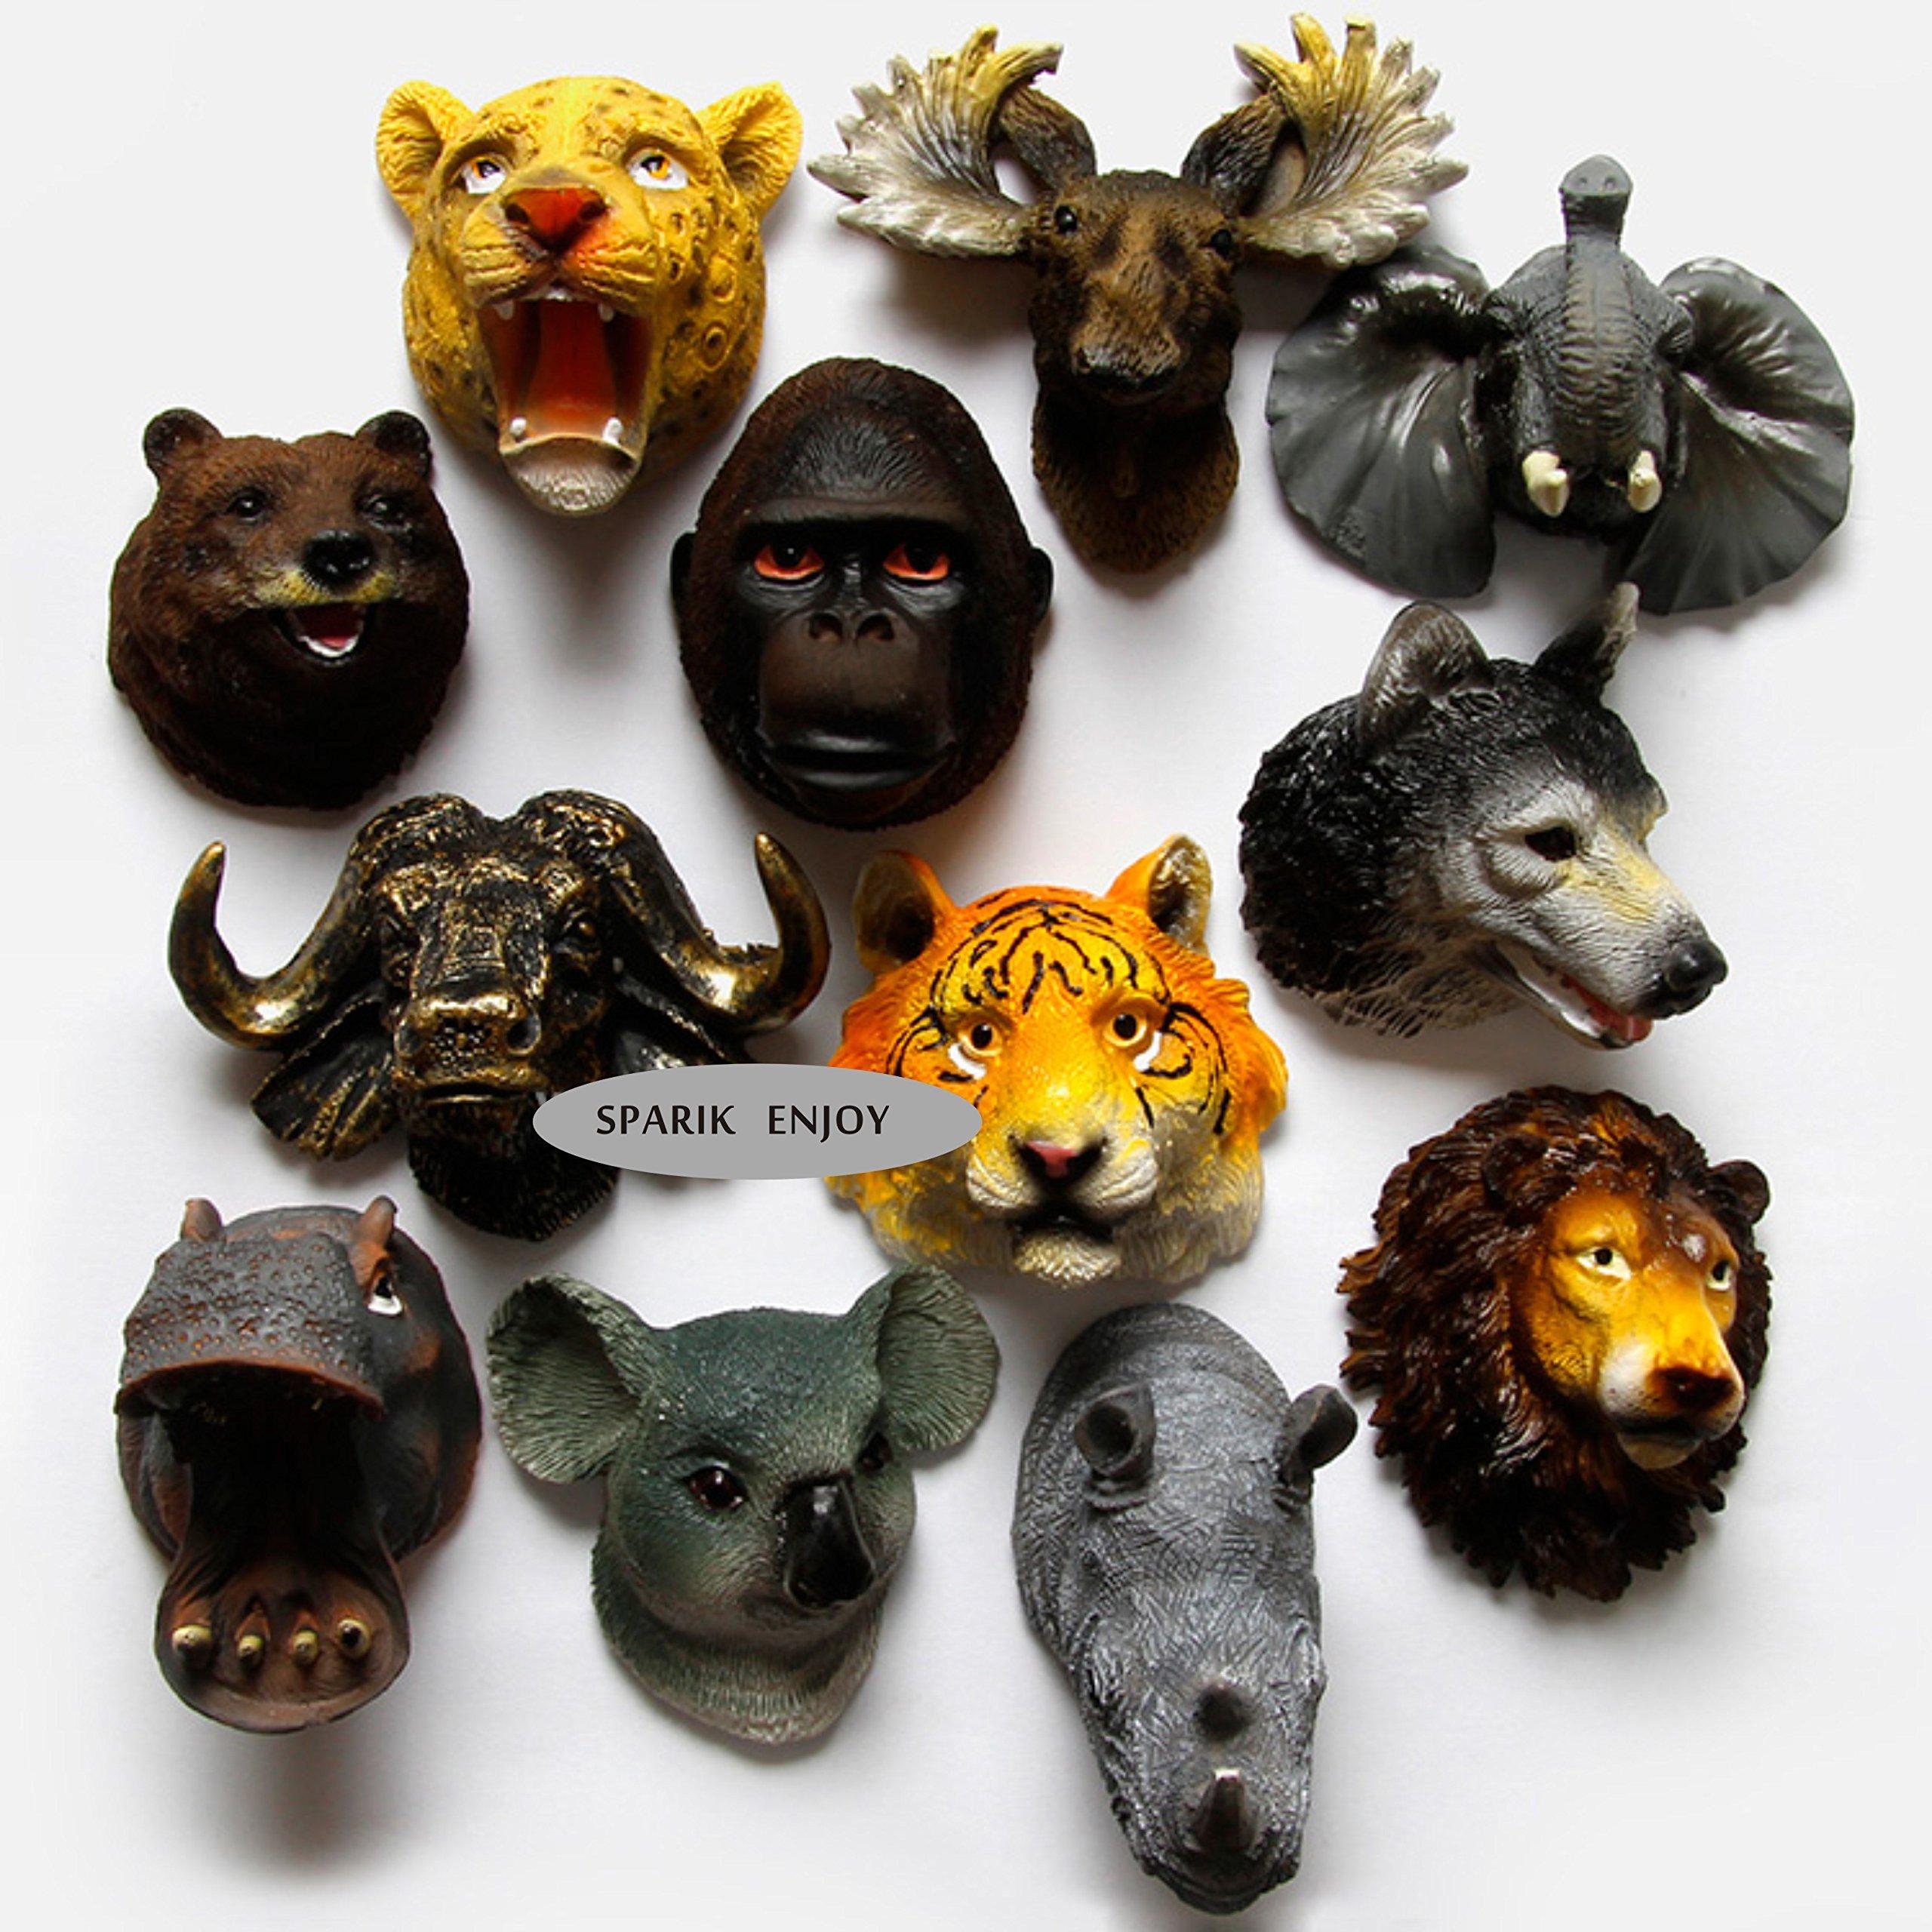 SPARIK ENJOY (TM) Set of 4 Awesome 3D Safari Animal Heads Refrigerator Magnets,Door Magnets, Wolf - Orangutan - Rhino - Tiger Fridge Magnets